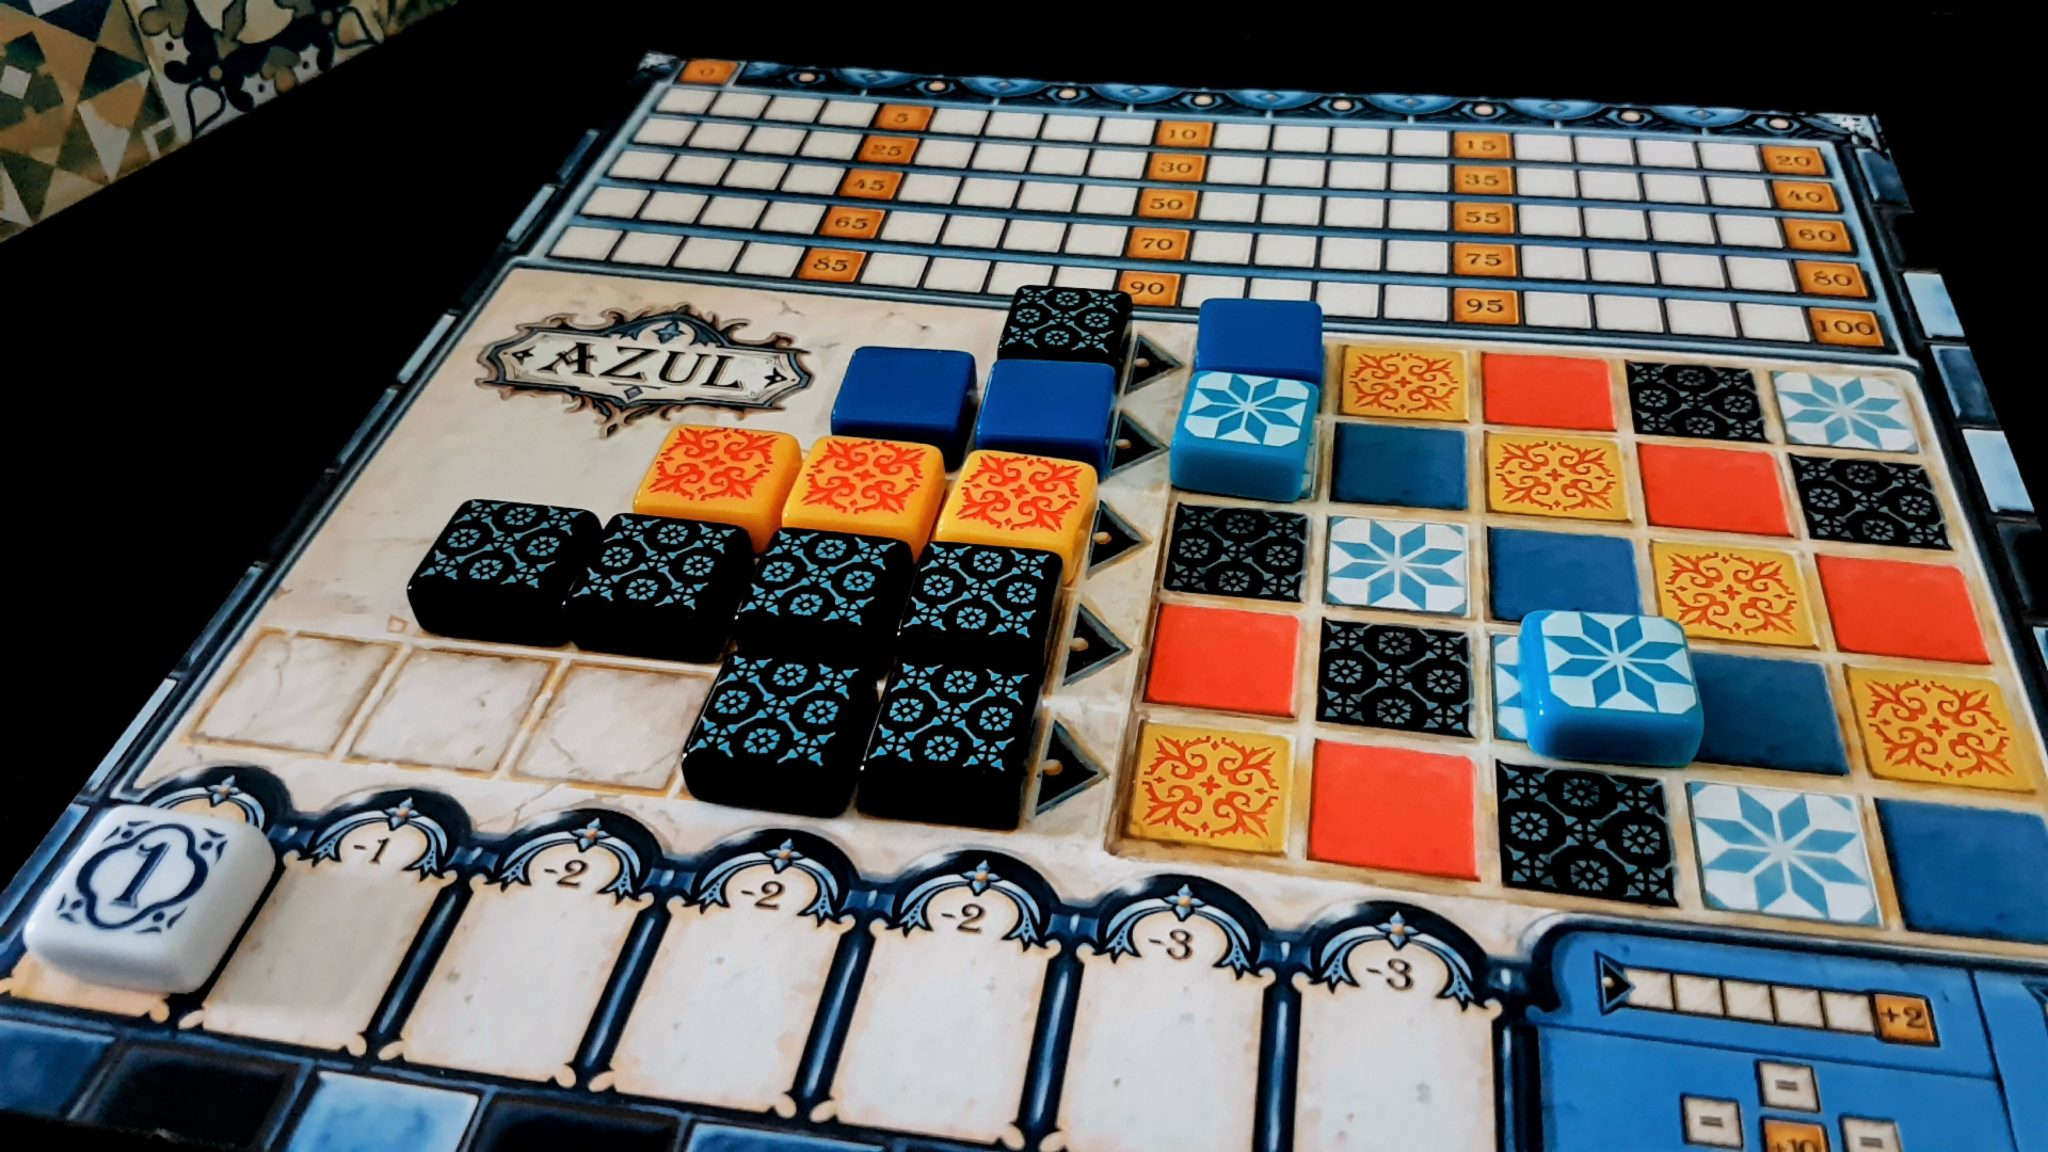 An untidy Azul board